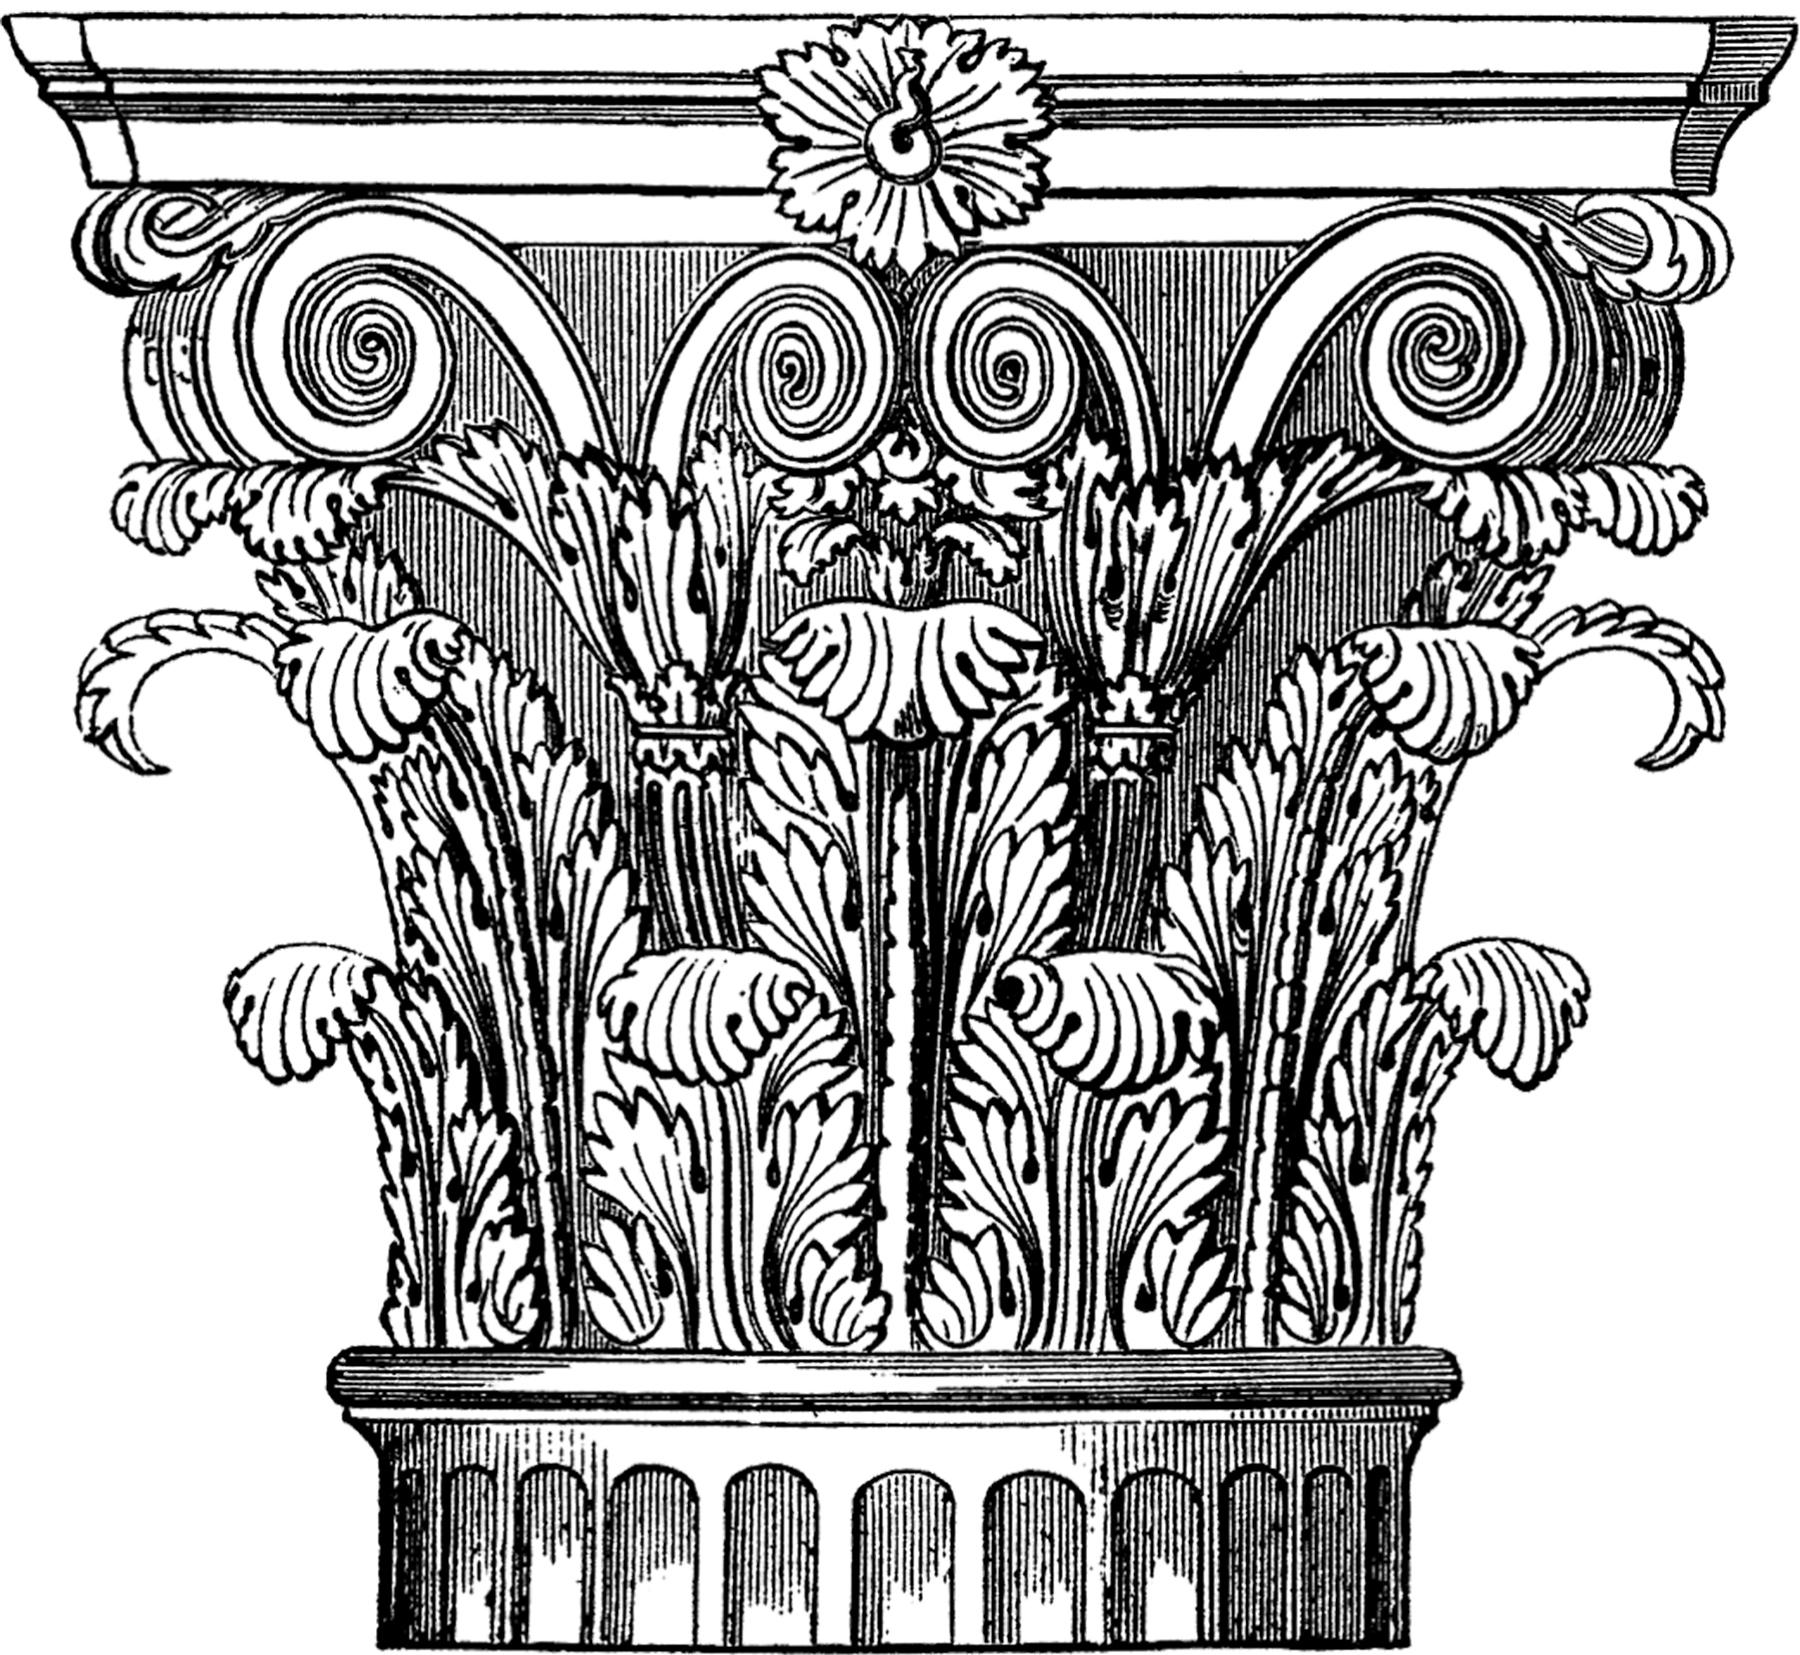 Ornate Corinthian Column Image! - The Graphics Fairy